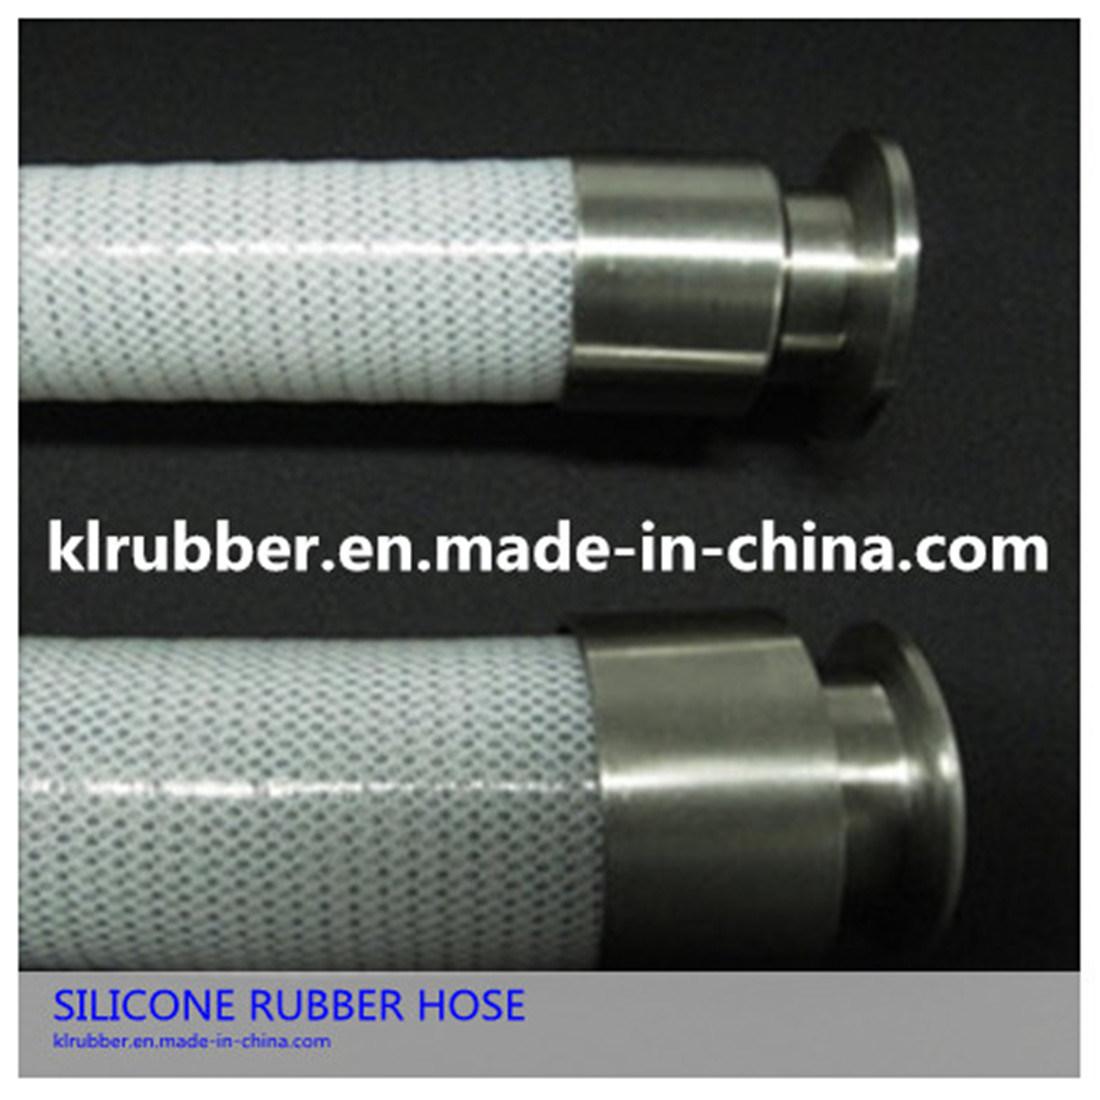 Large Diameter No Smell Medical Grade Silicone Rubber Vacuum Hose